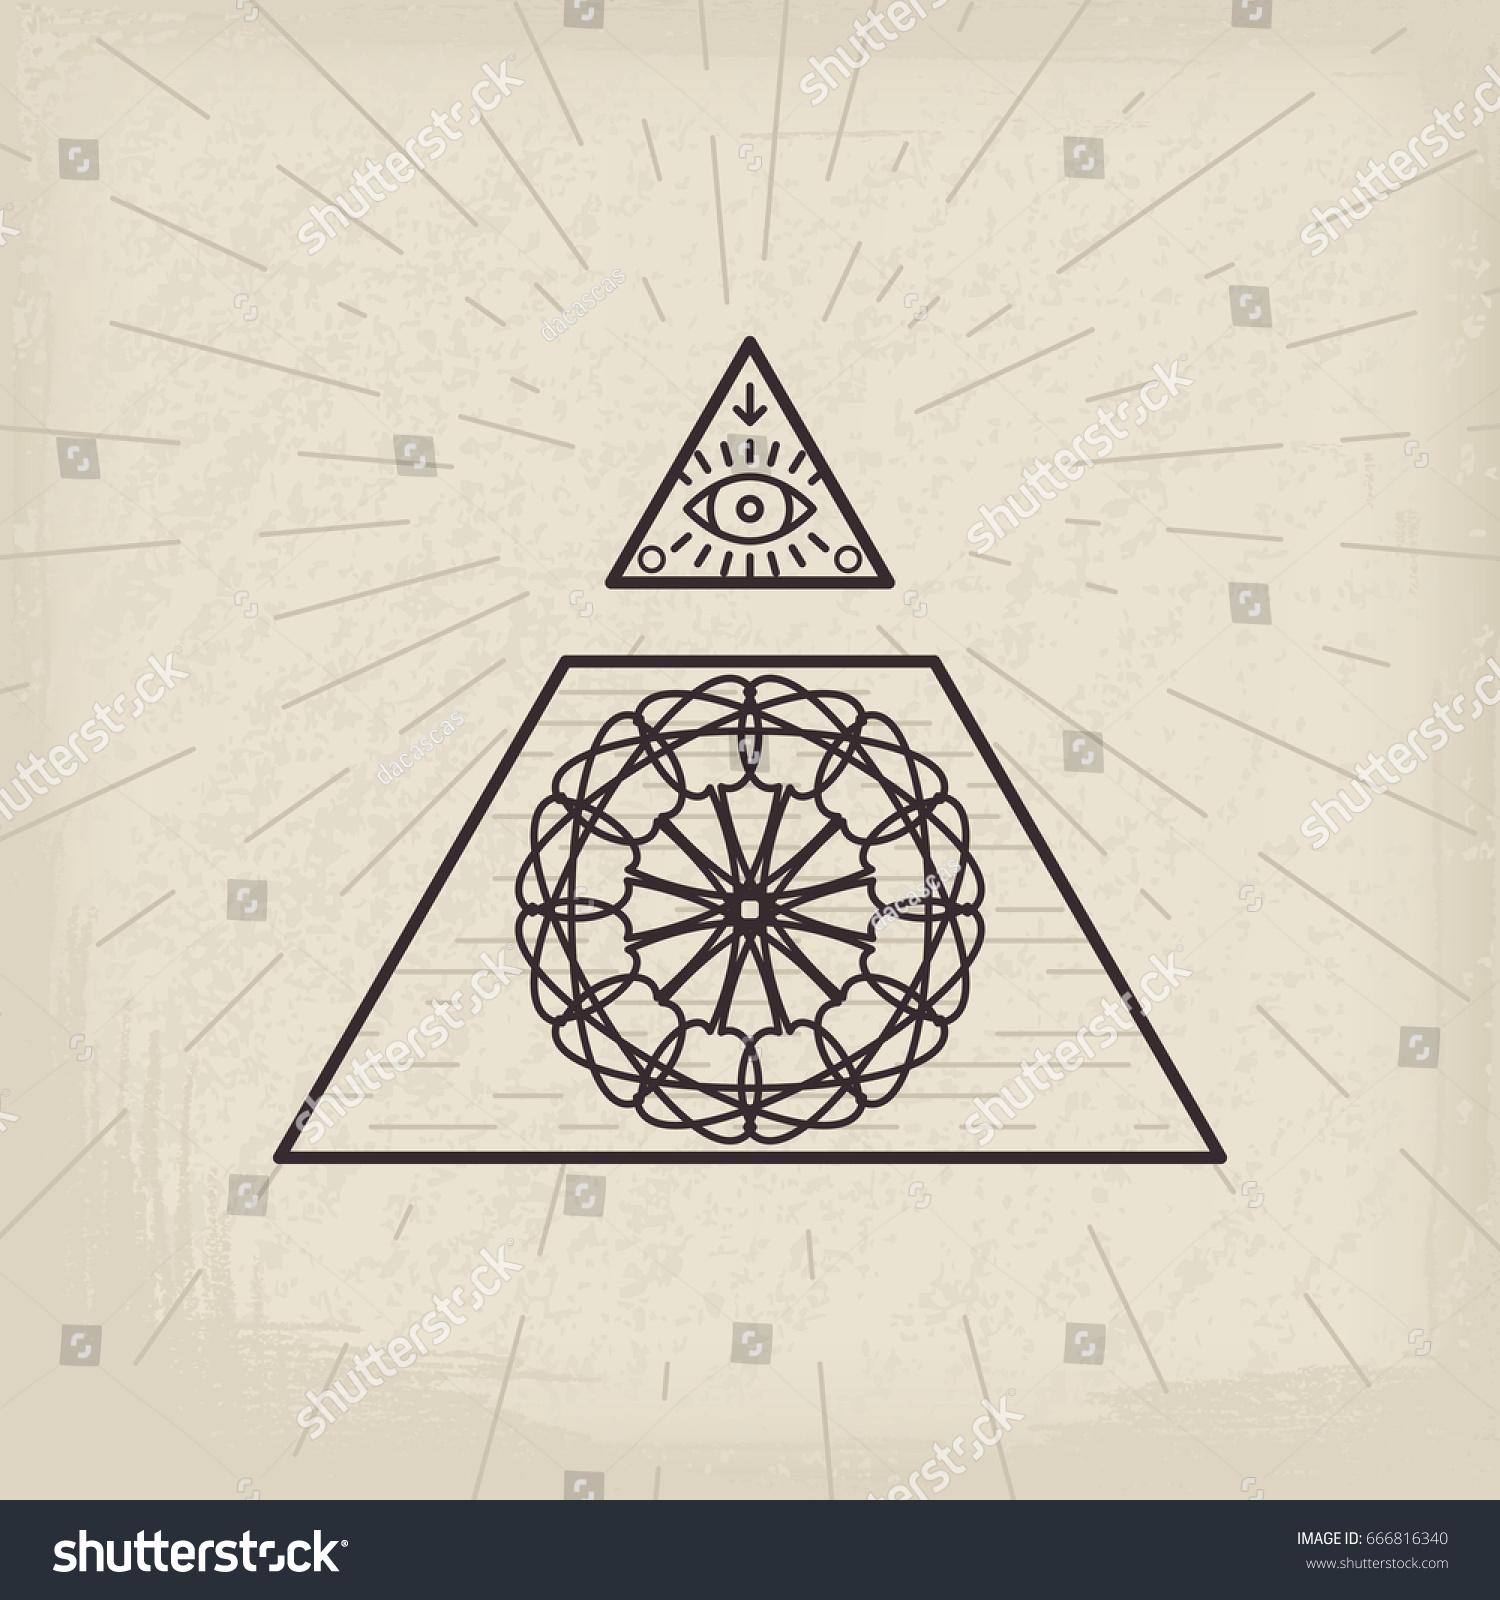 All seeing eye magic circular symbol stock vector 666816340 all seeing eye and magic circular symbol inside triangle pyramid vintage esoteric background buycottarizona Image collections